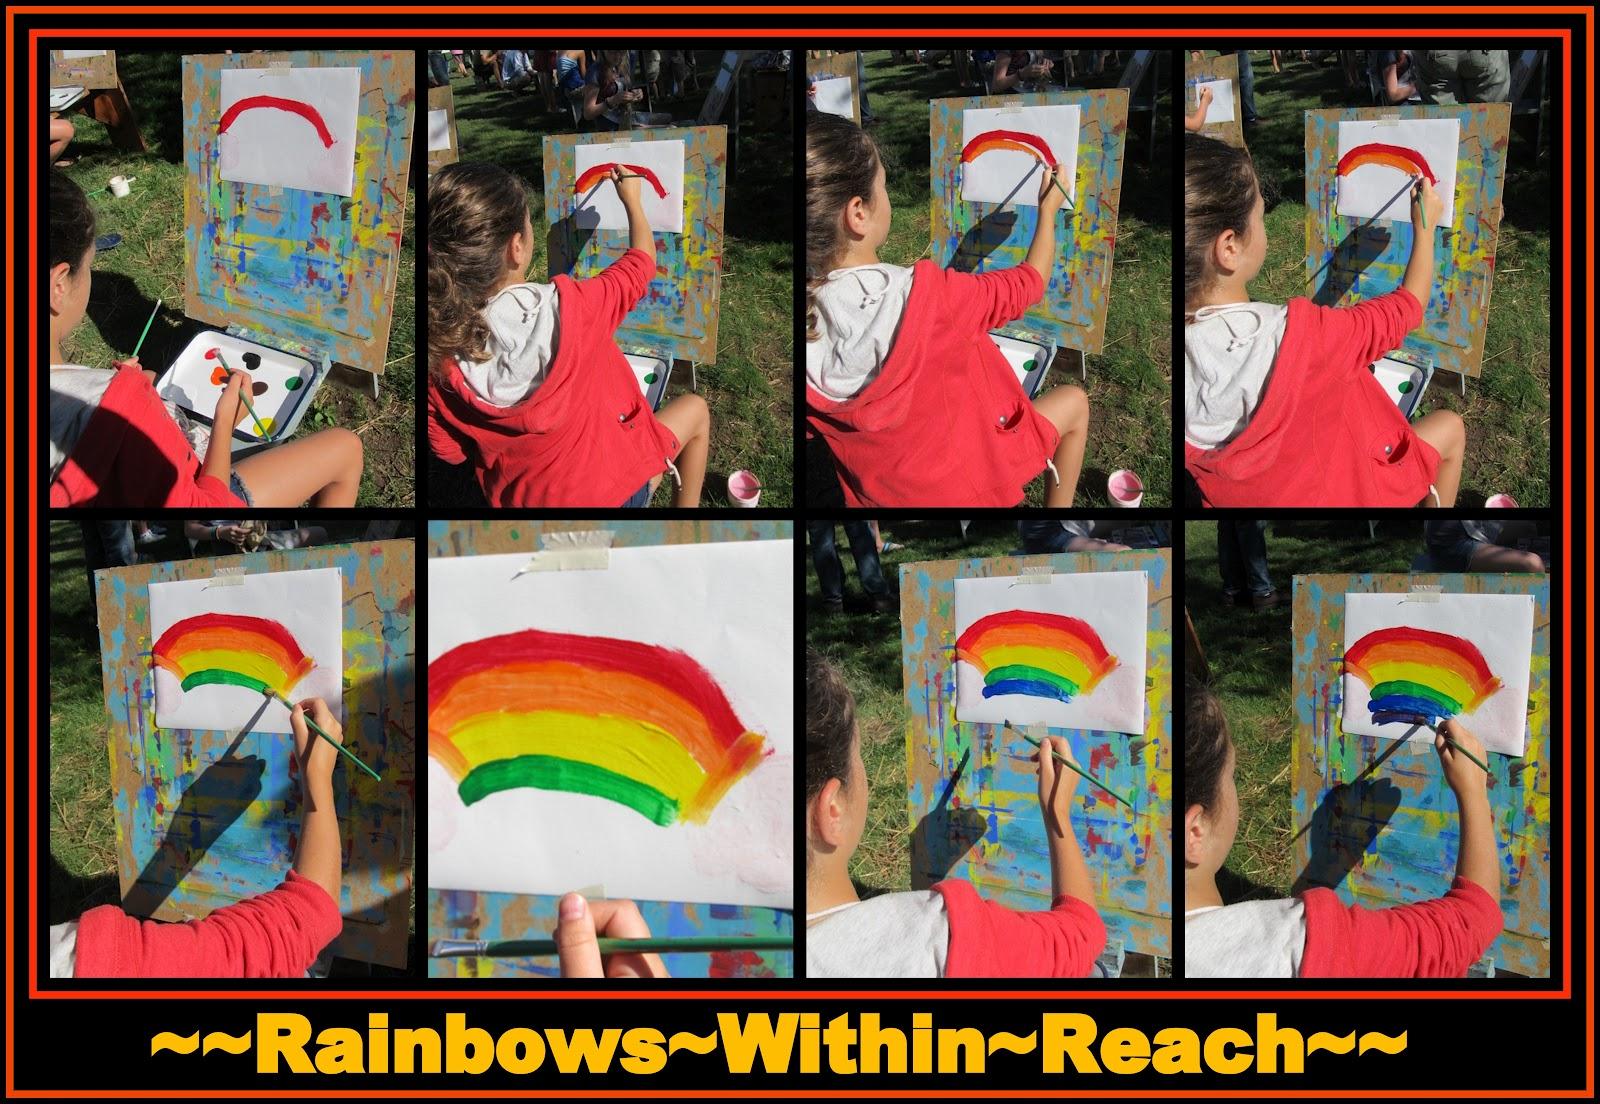 Rainbowswithinreachspot